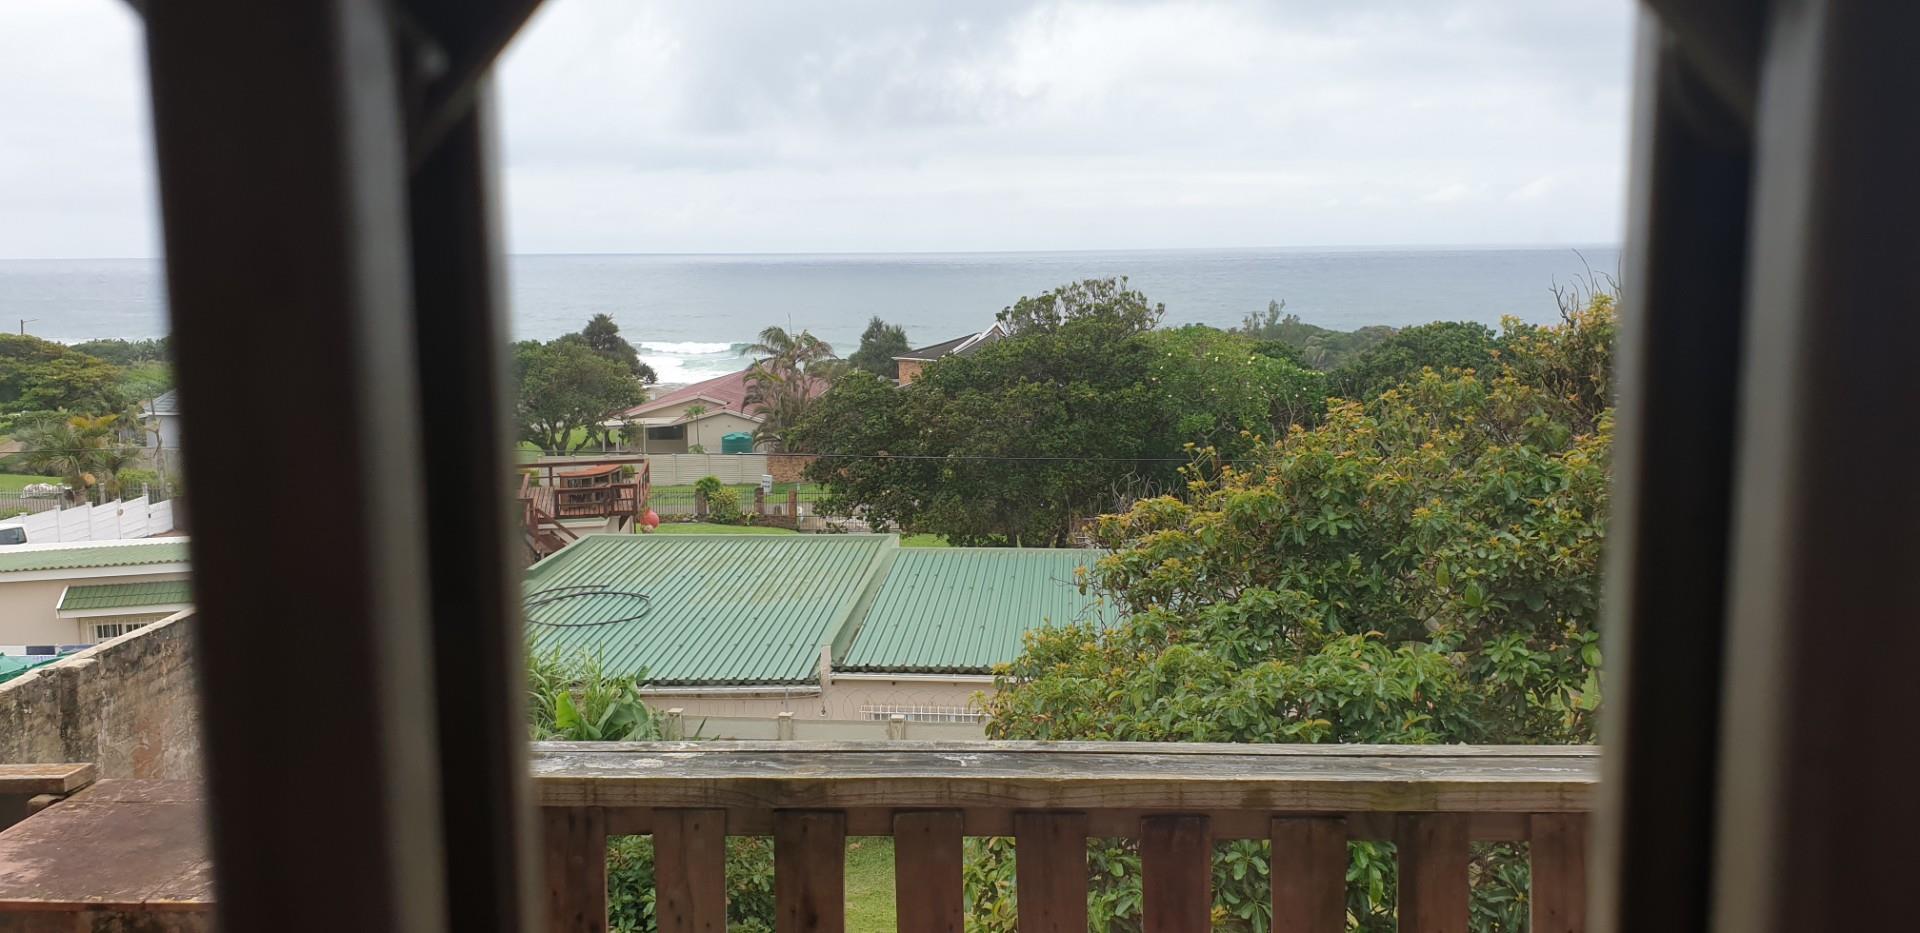 4 Bedroom House For Sale in Port Edward